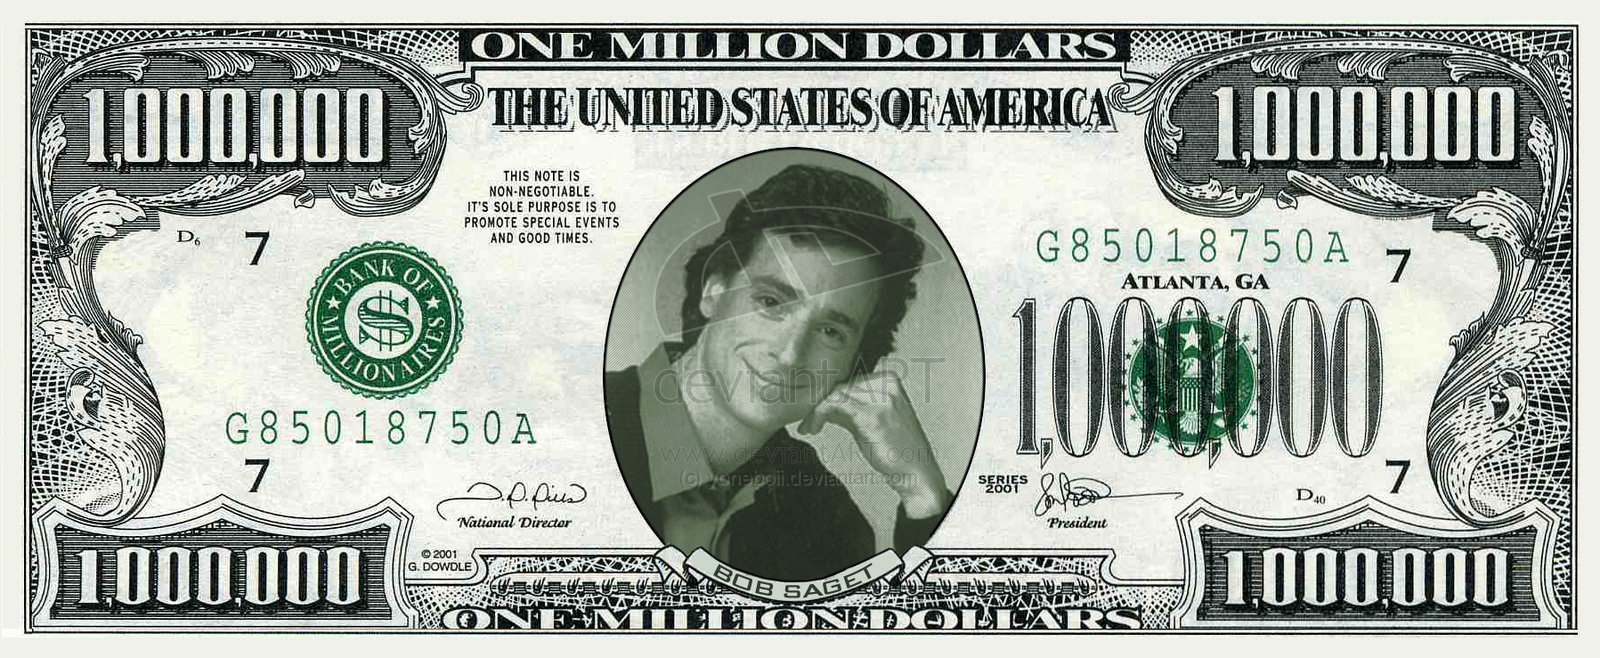 Best Photos Of A Million Dollar Bill Print Printable Fake One 1 - Free Printable Million Dollar Bill